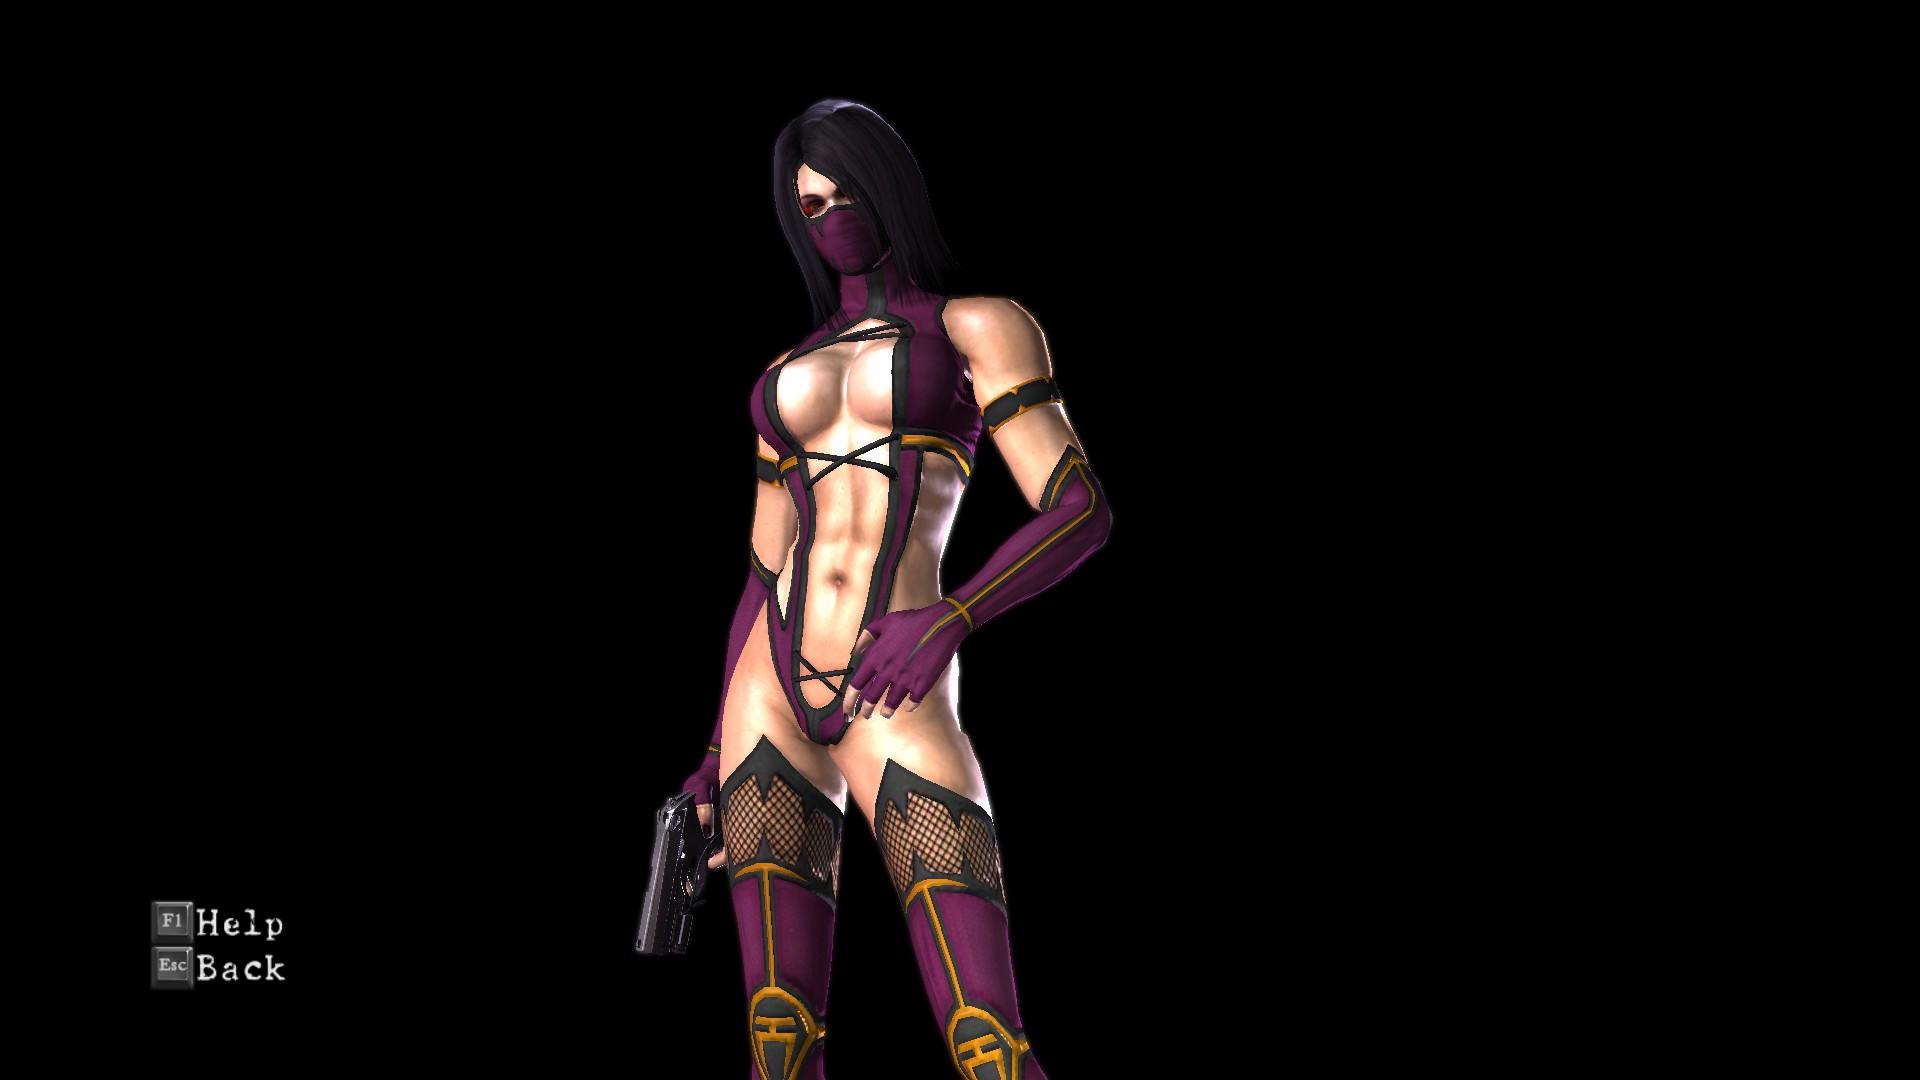 Mortal Kombat Girls 0_11f040_8904329_orig